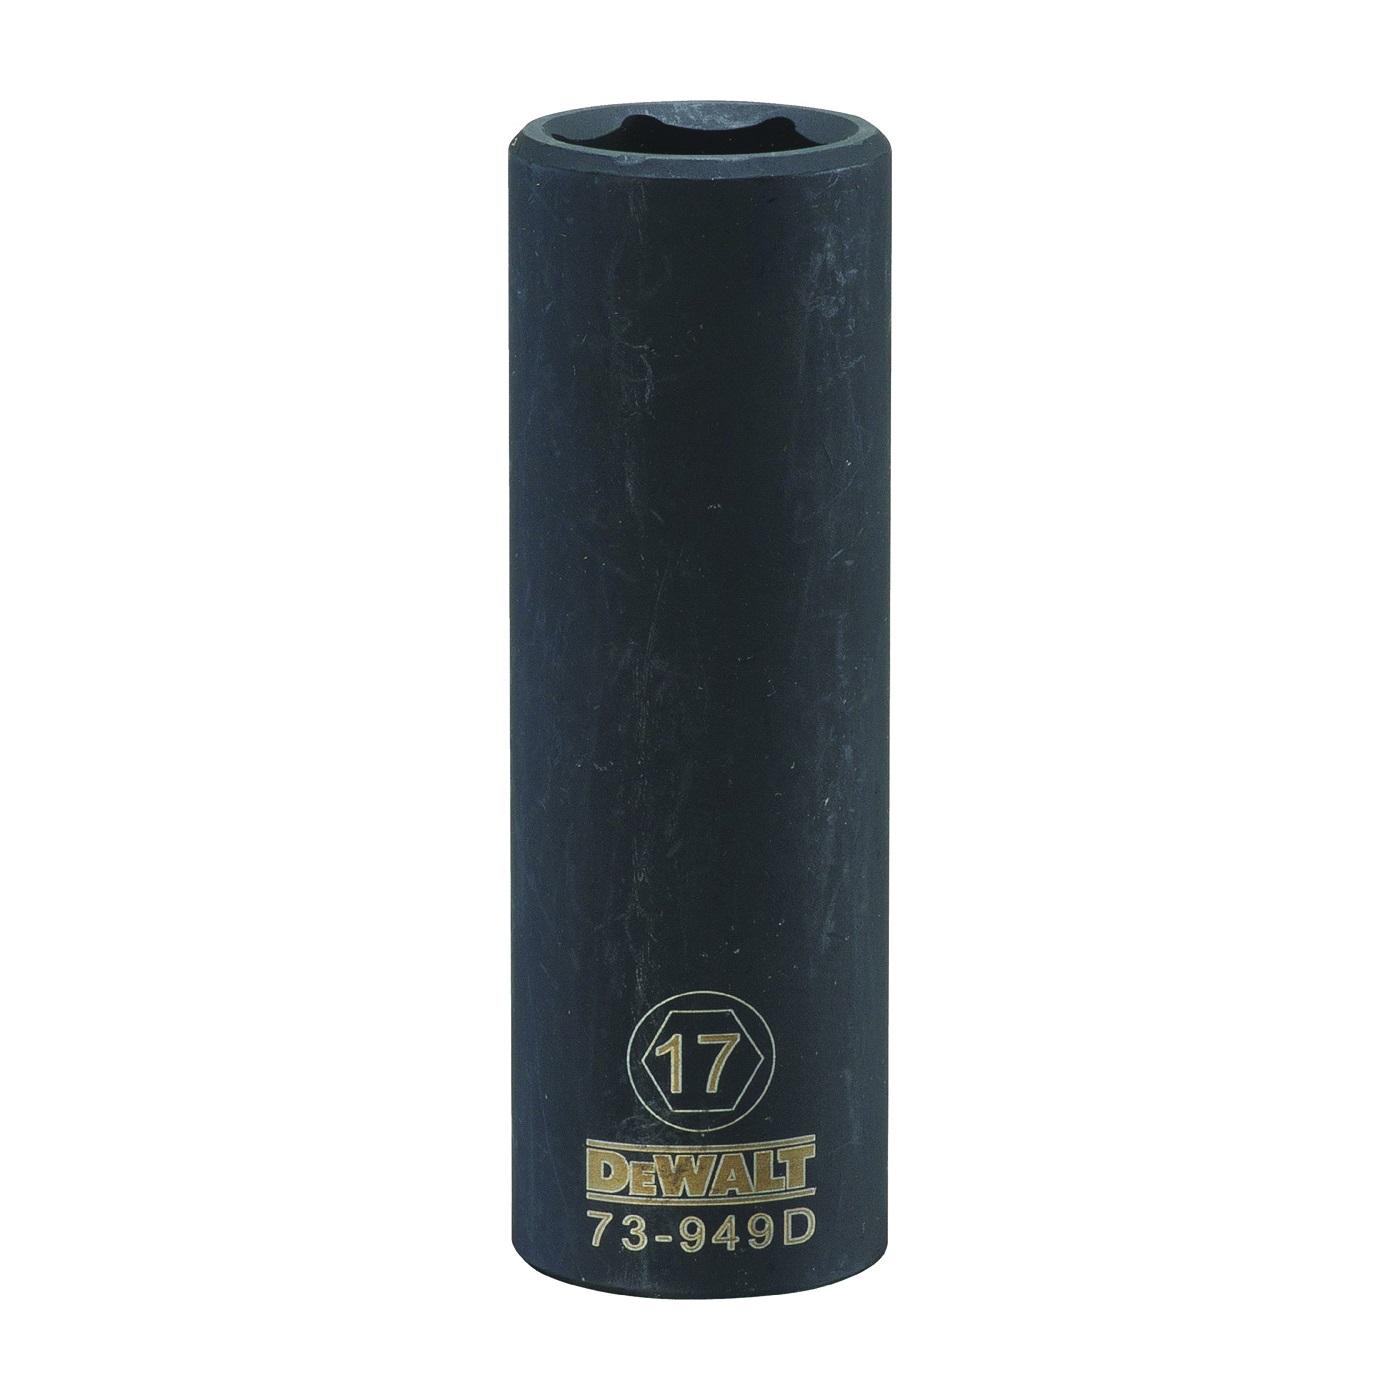 Picture of DeWALT DWMT73949OSP Impact Socket, 17 mm Socket, 1/2 in Drive, 6 -Point, CR-440 Steel, Black Oxide